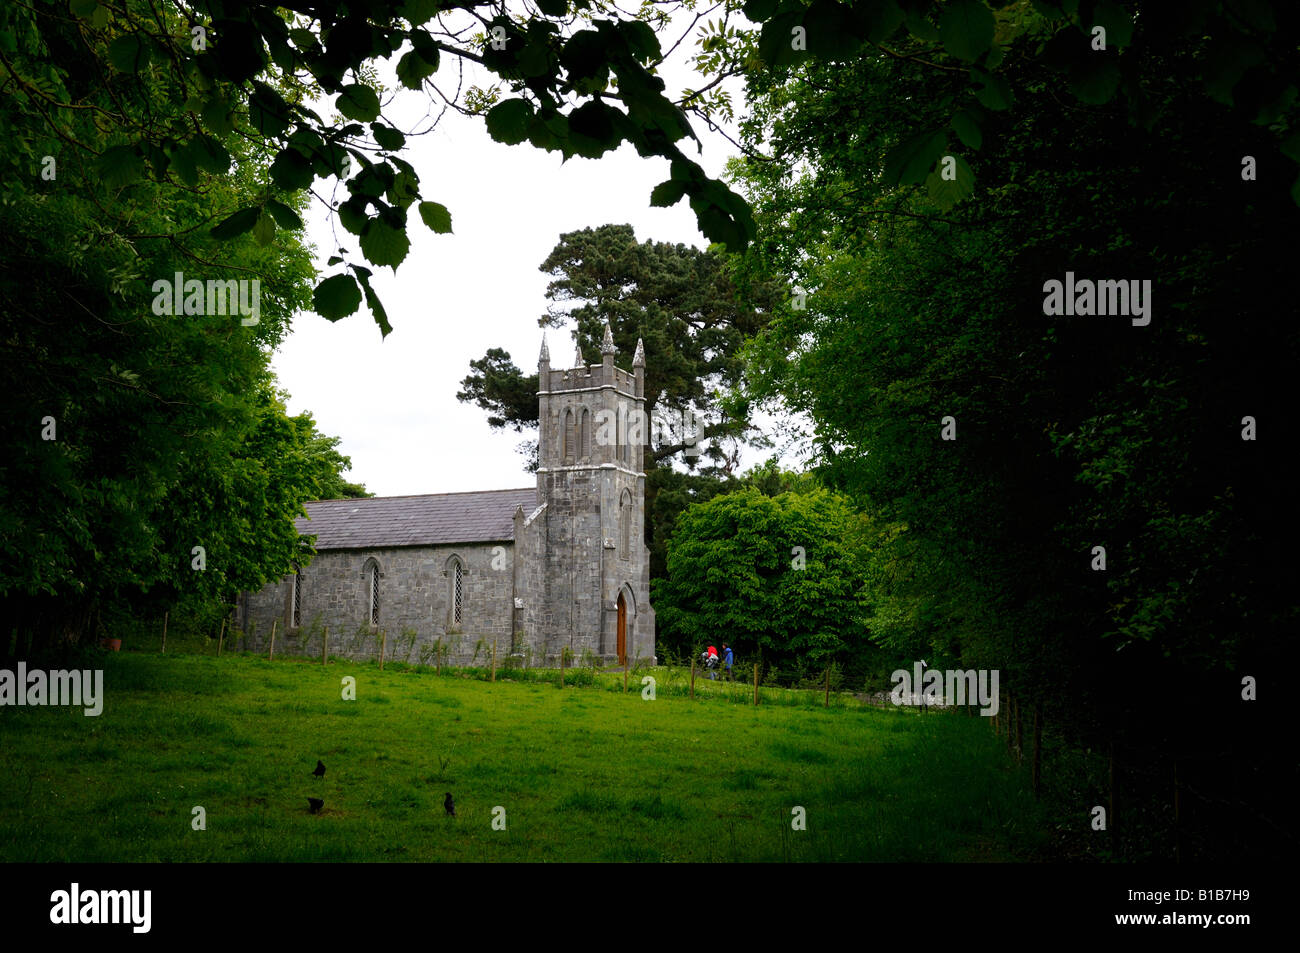 A church in Irish countryside. County Clare, Ireland. - Stock Image